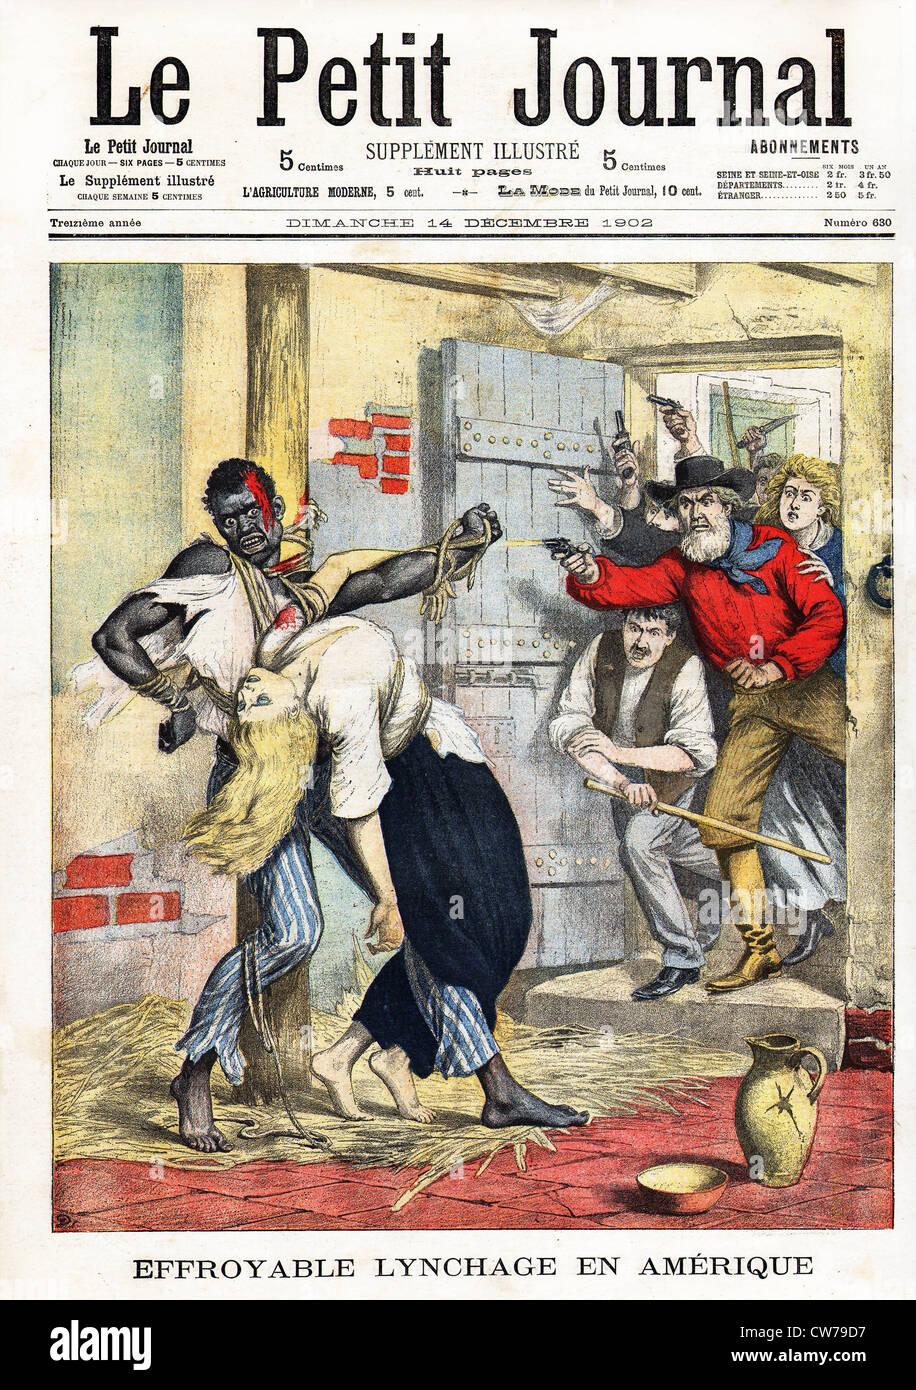 Terrible lynching in America - Stock Image